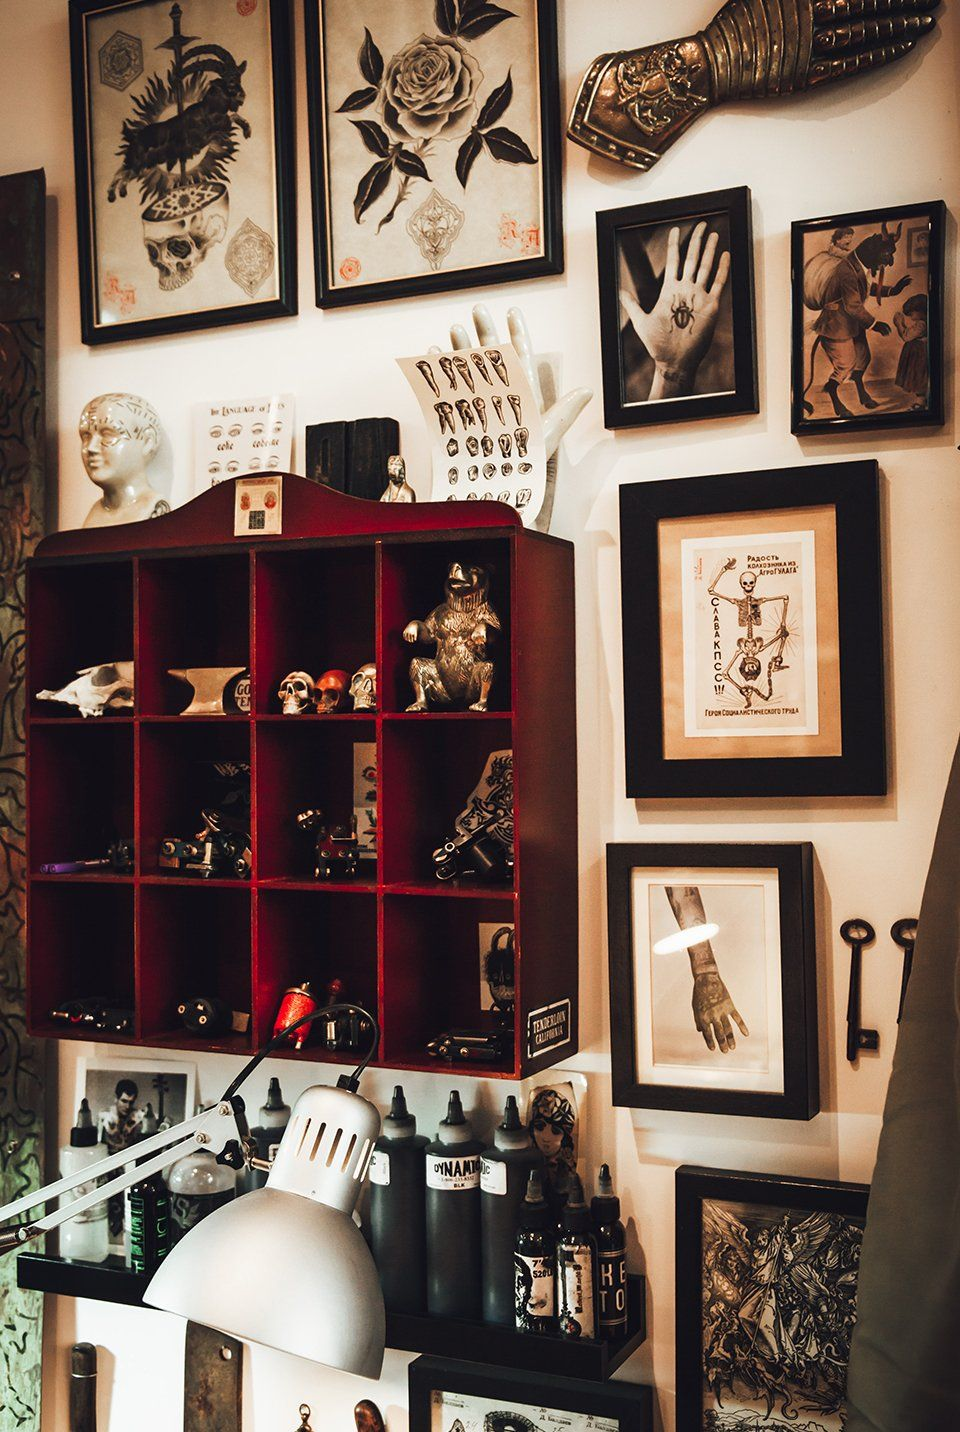 House of thieves tattoo studio p co habitat pinterest tattoo studio studio and tattoo - Tattoo studio decor ...